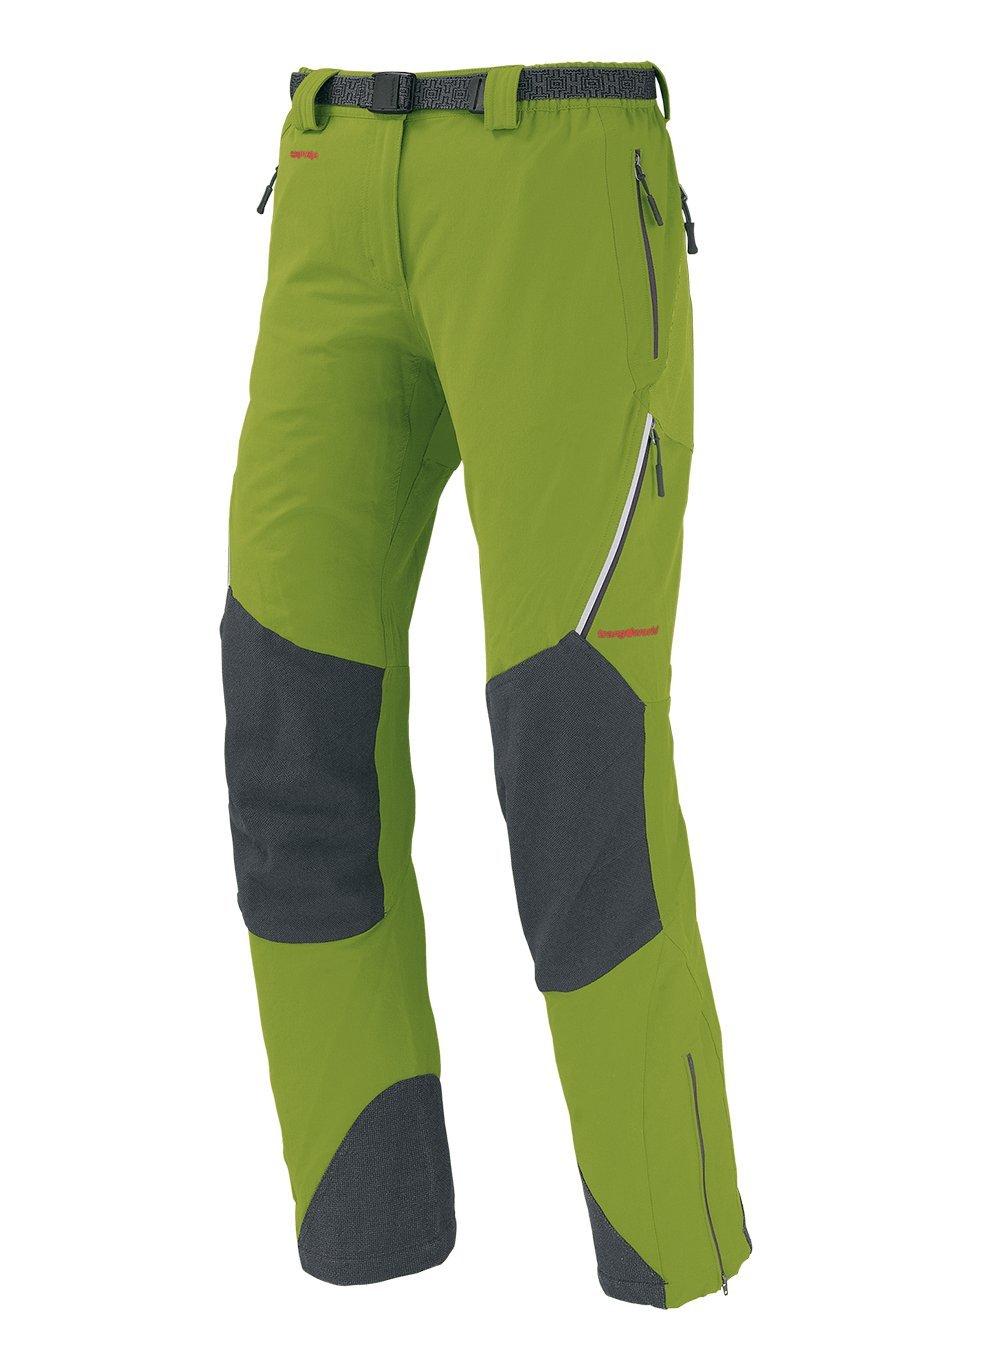 Trango Damen Hose Pants Largo UHSI FI, 8433849276053